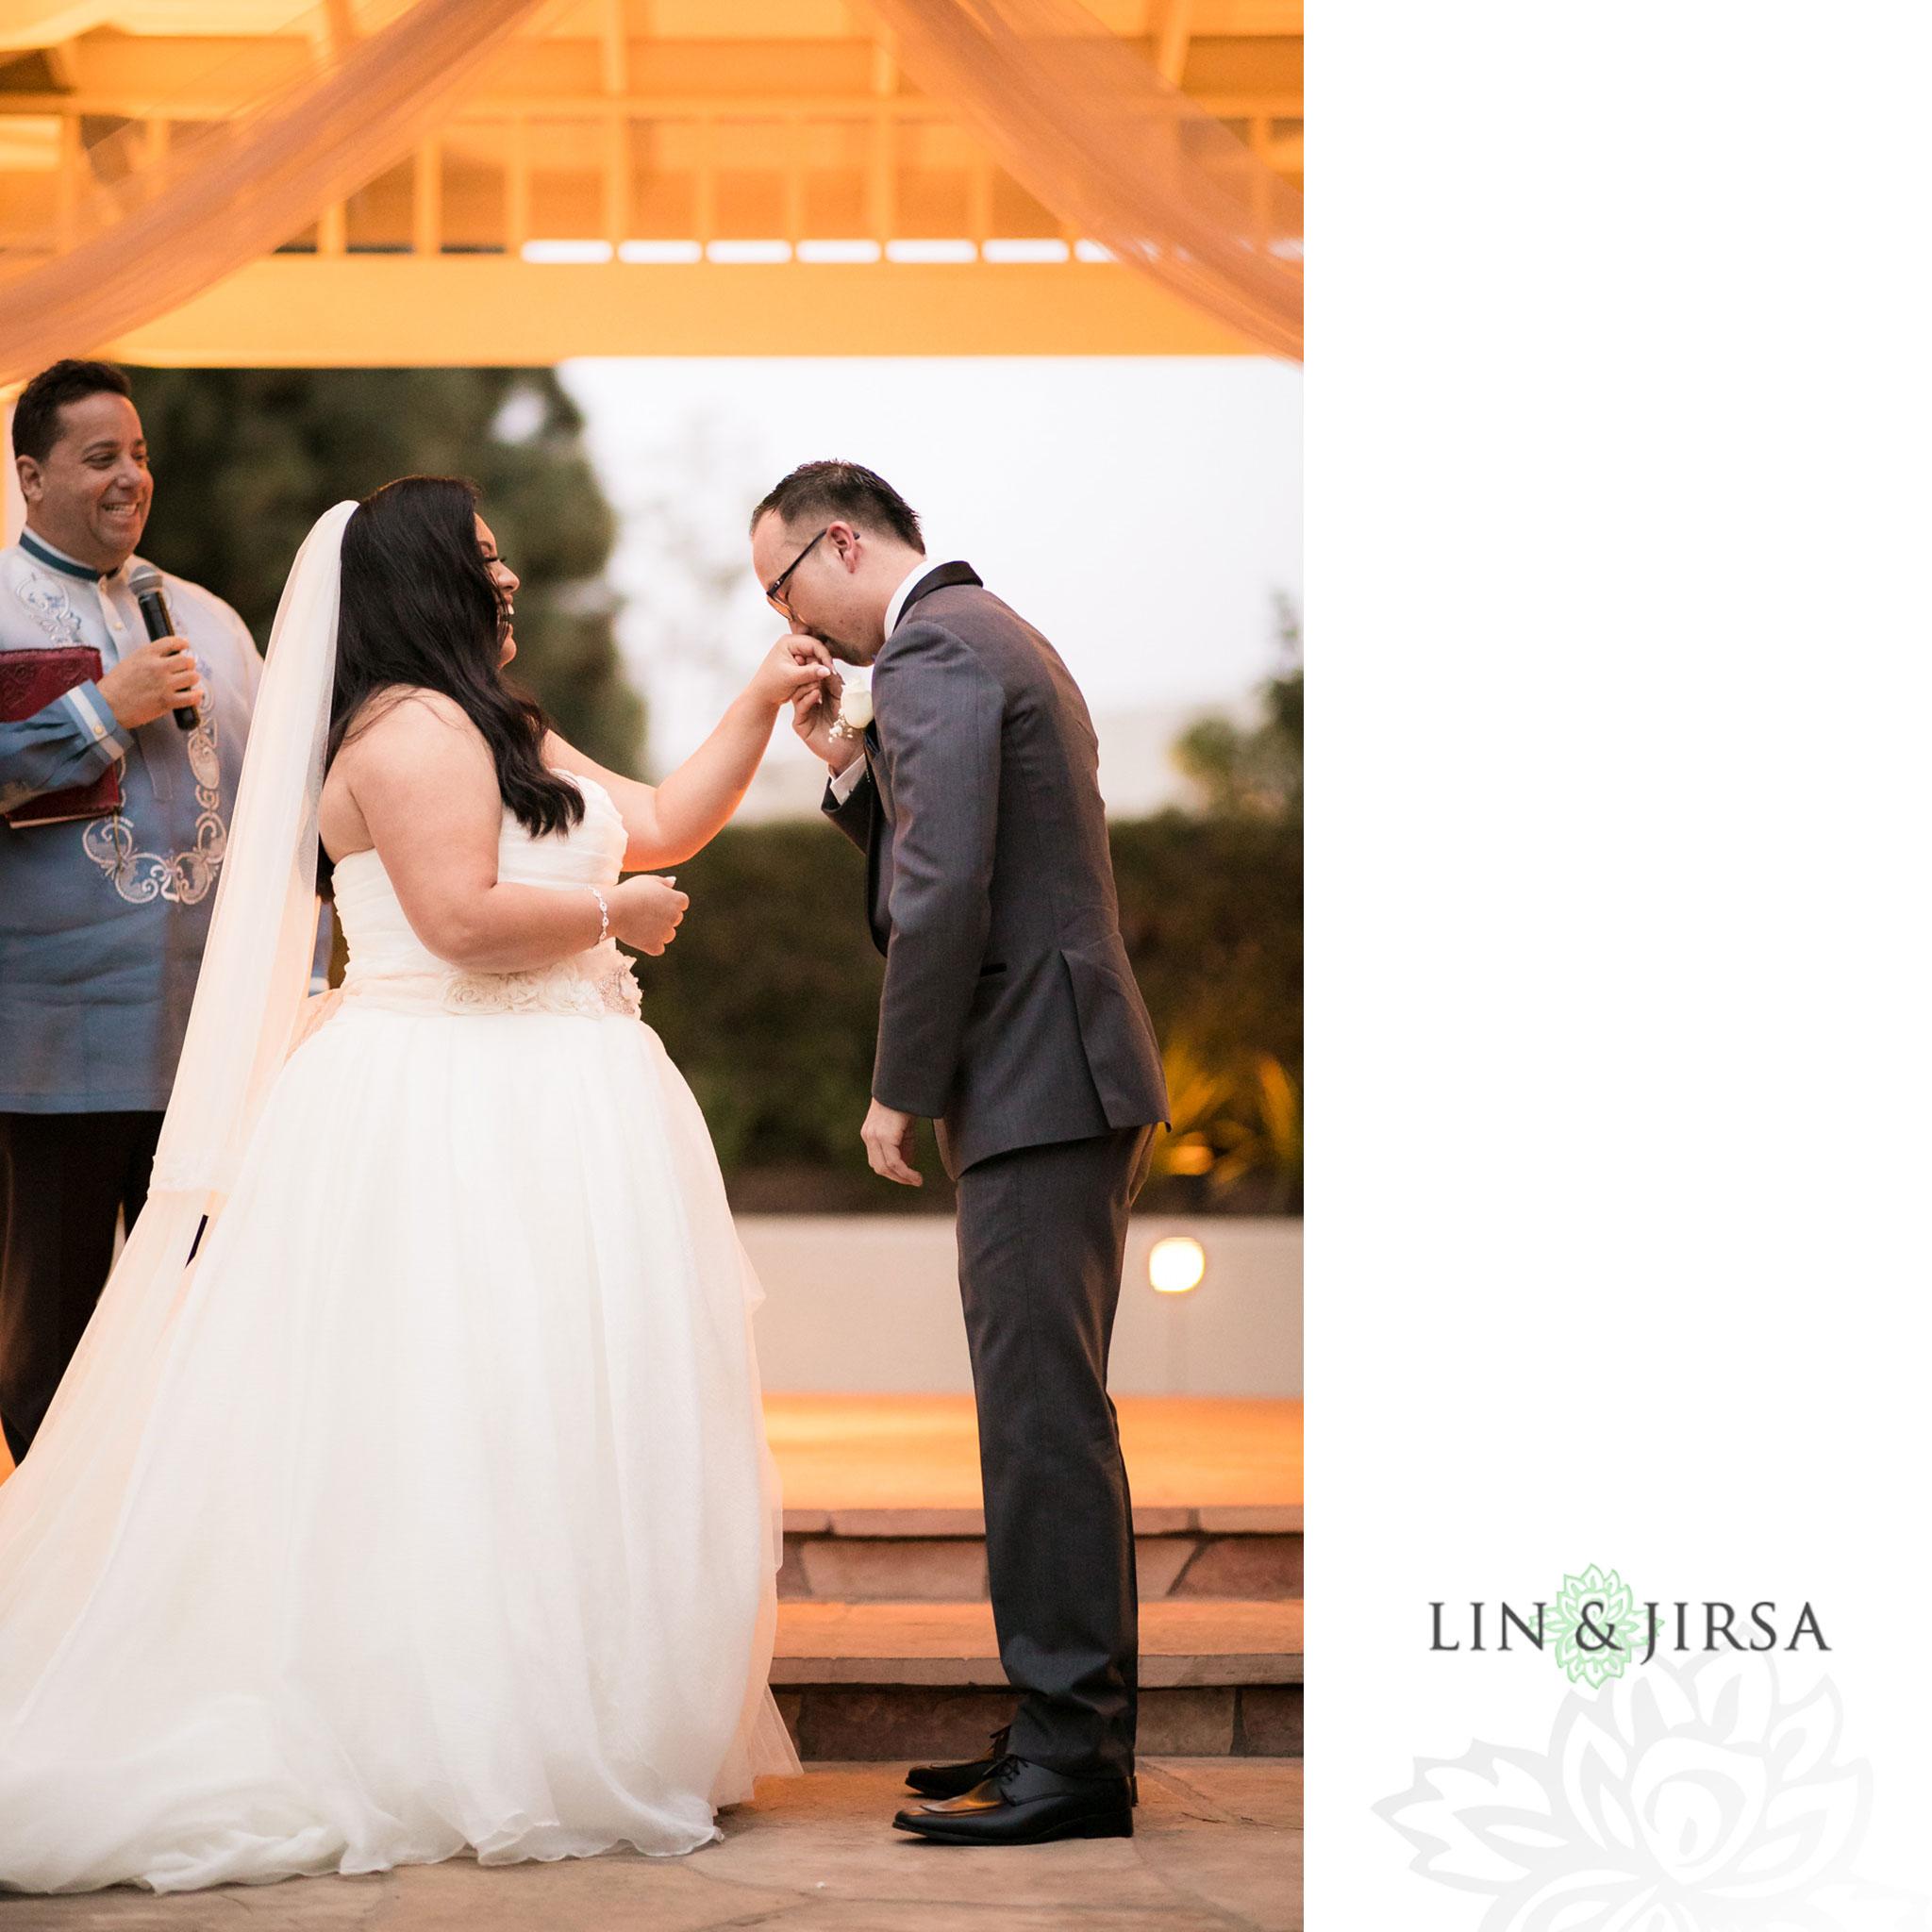 25 turnip rose promenade orange county wedding ceremony photography